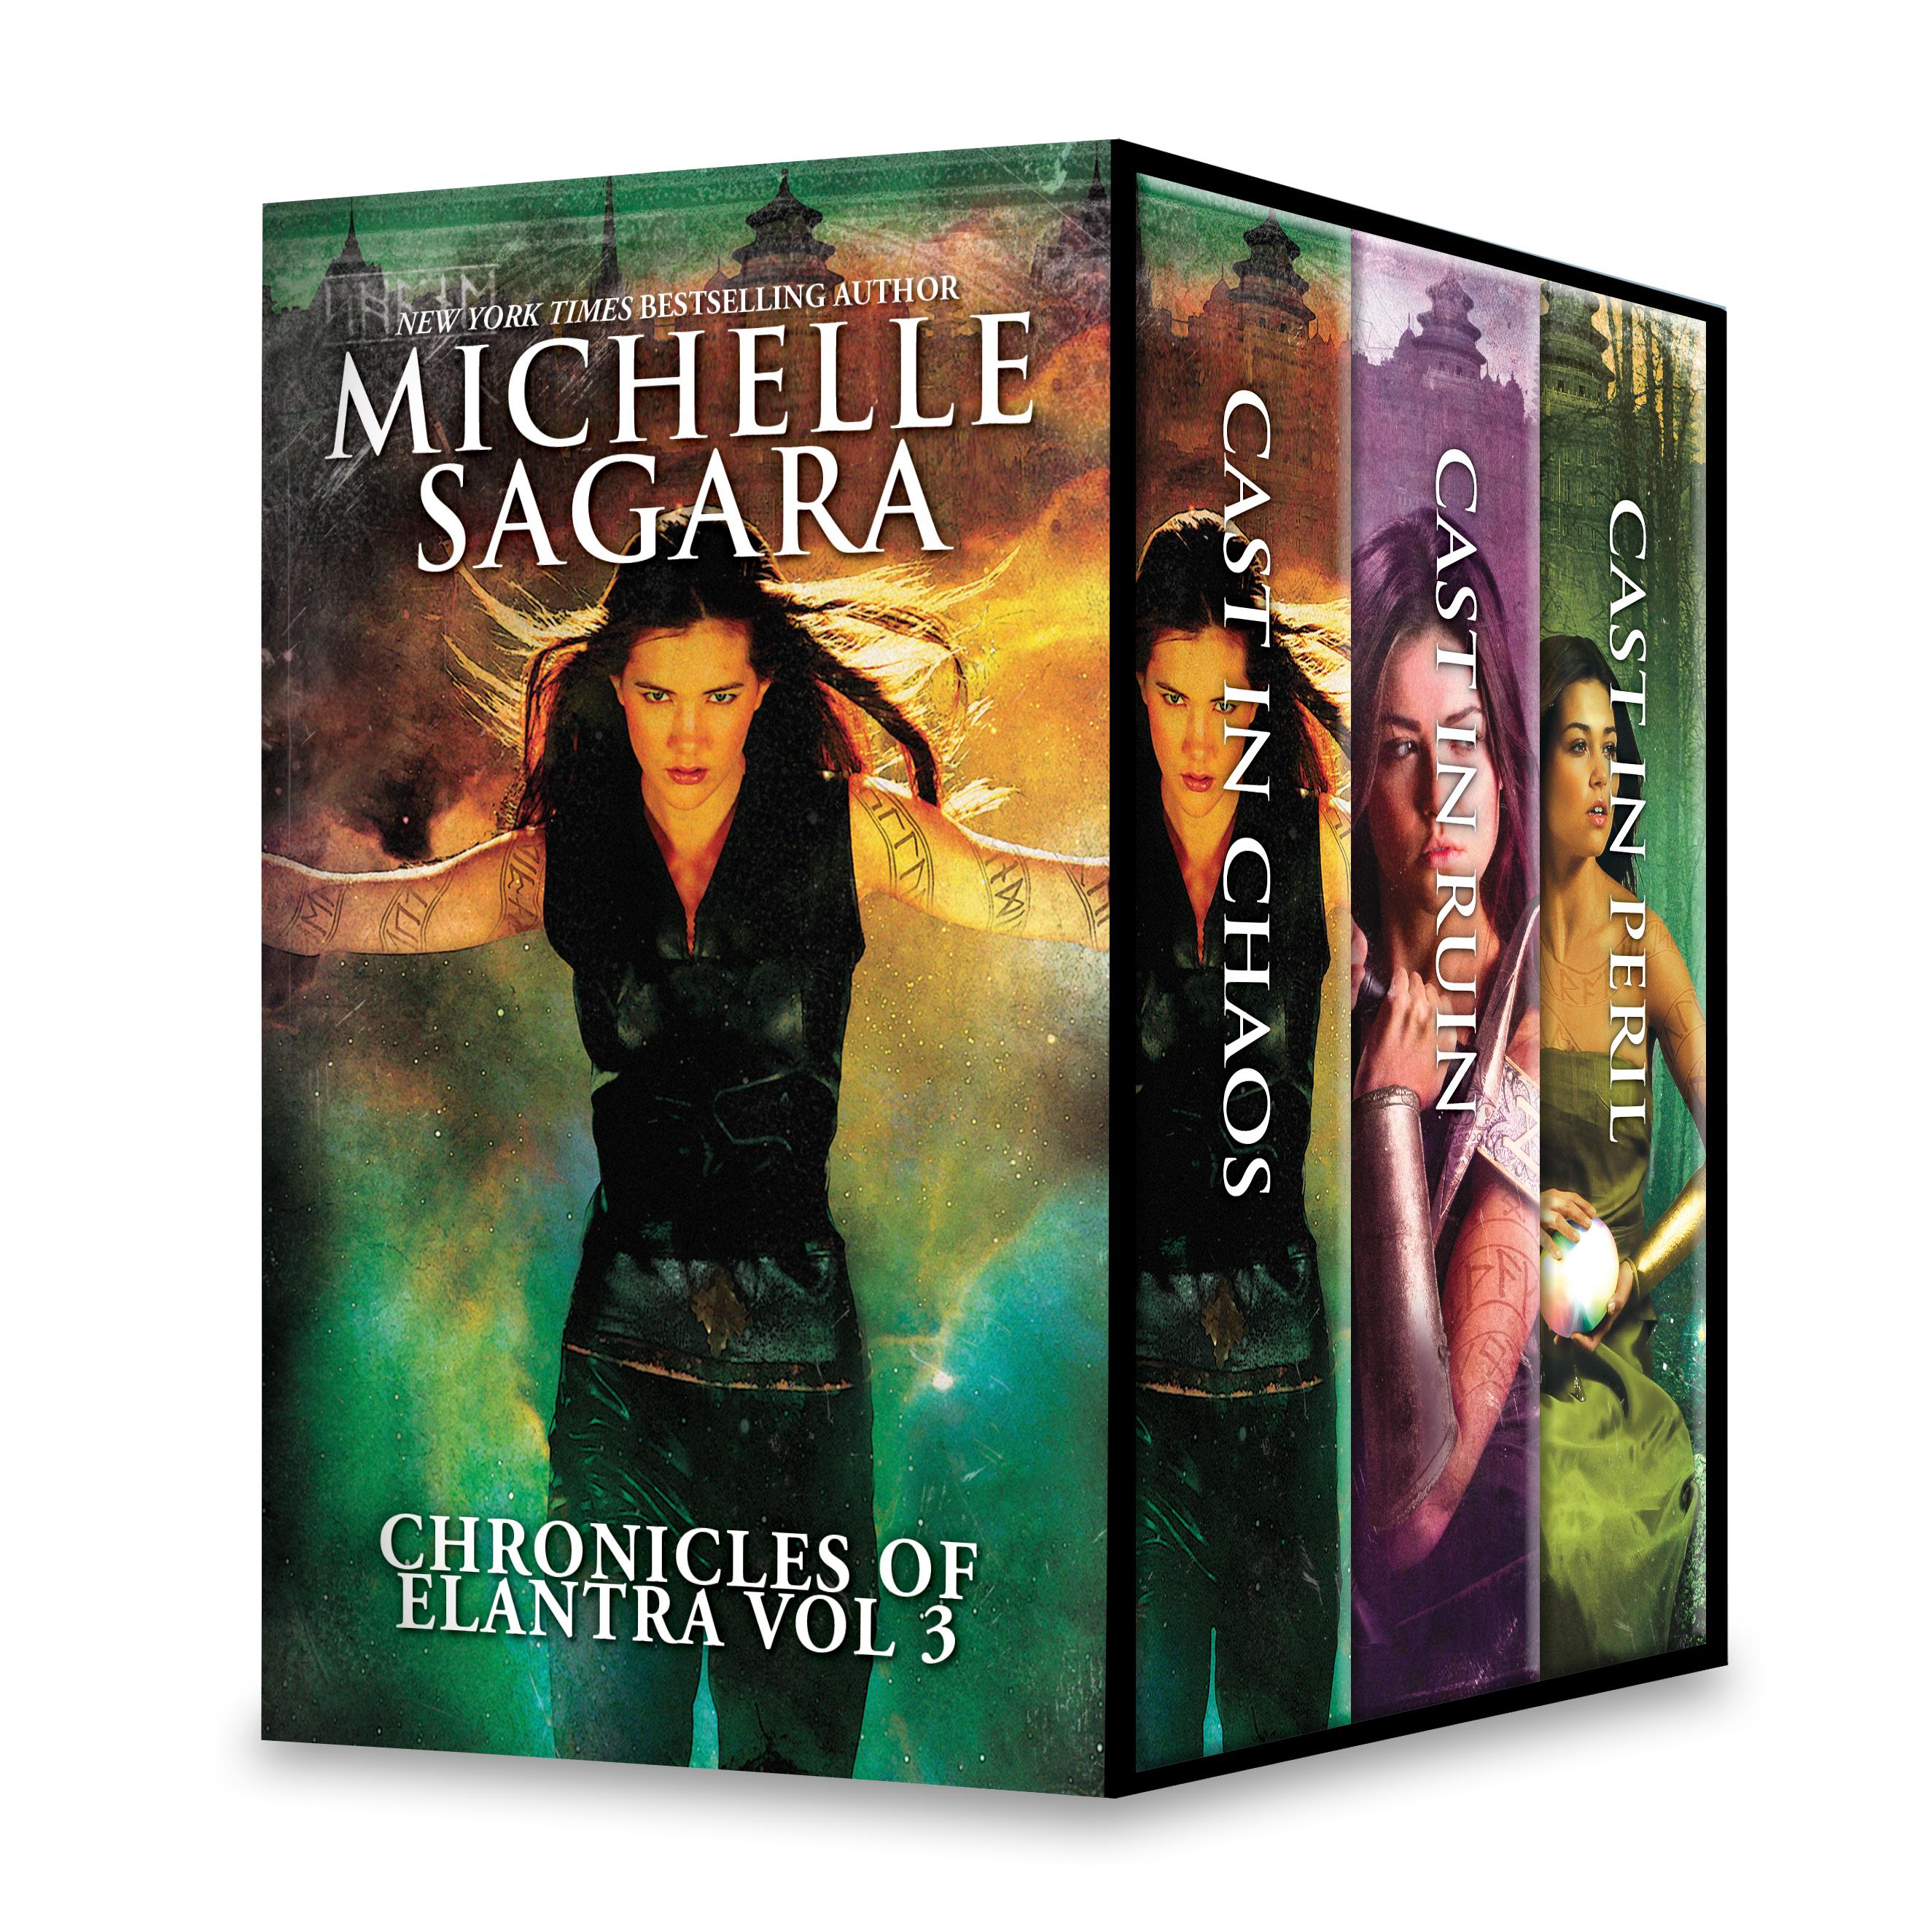 Michelle Sagara Chronicles of Elantra Vol 3 An Anthology